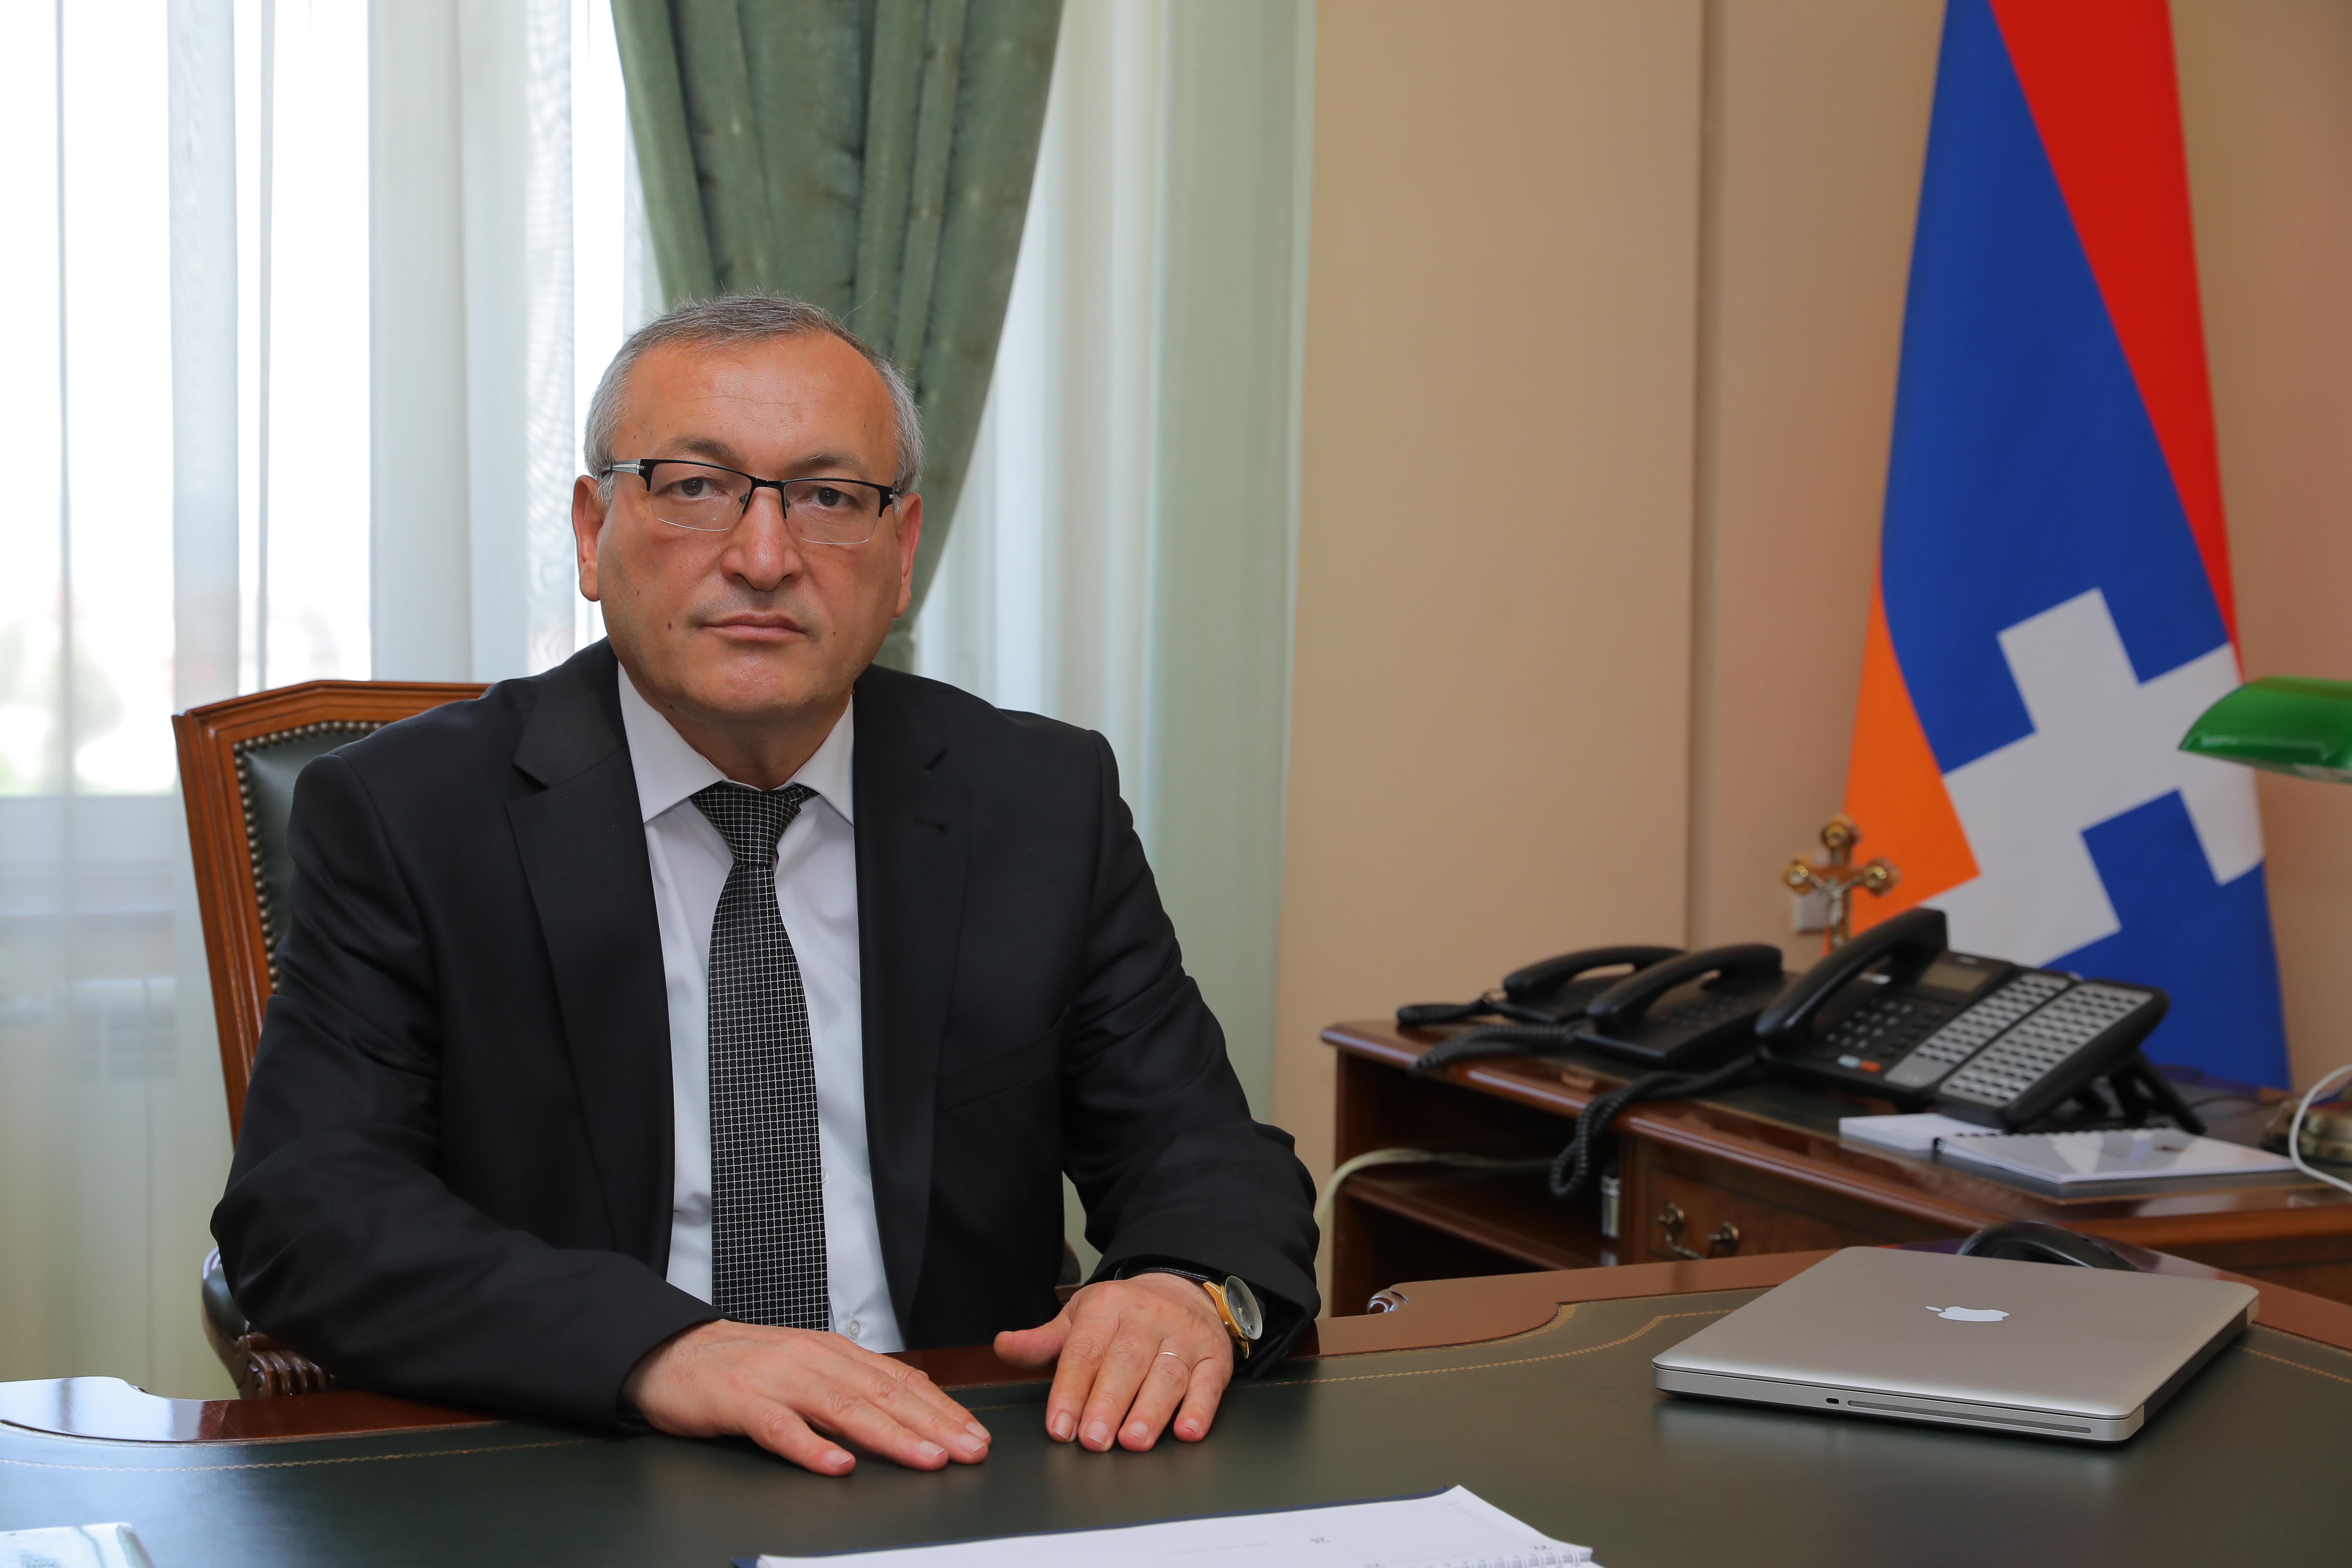 Photo of ԱՀ ԱԺ նախագահ Արթուր Թովմասյանը դատապարտել է Ադրբեջանի հերթական հայատյաց քաղաքականությունը